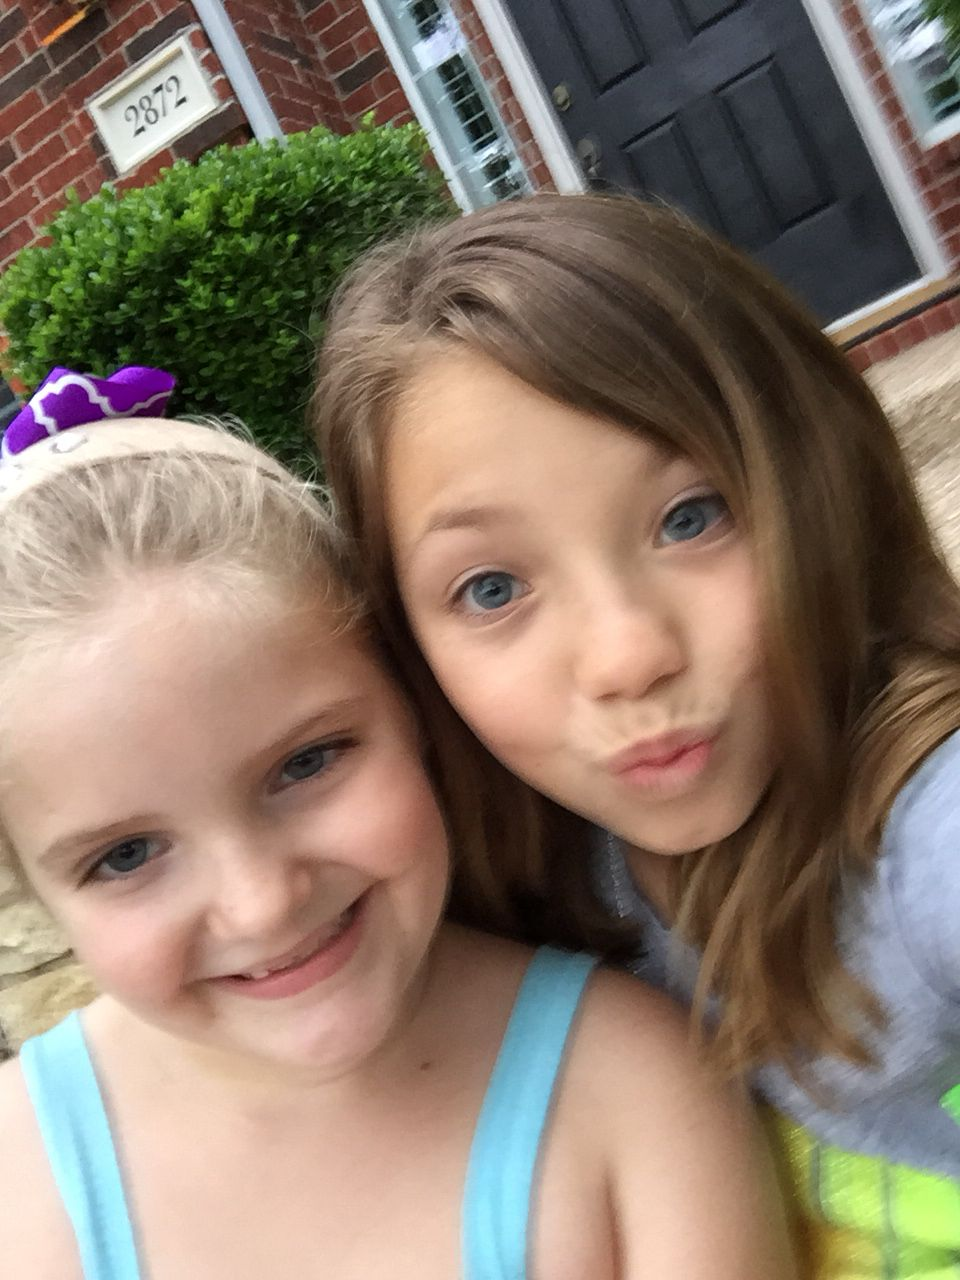 Fucking My Best Friend's Little Sister On Snapchat